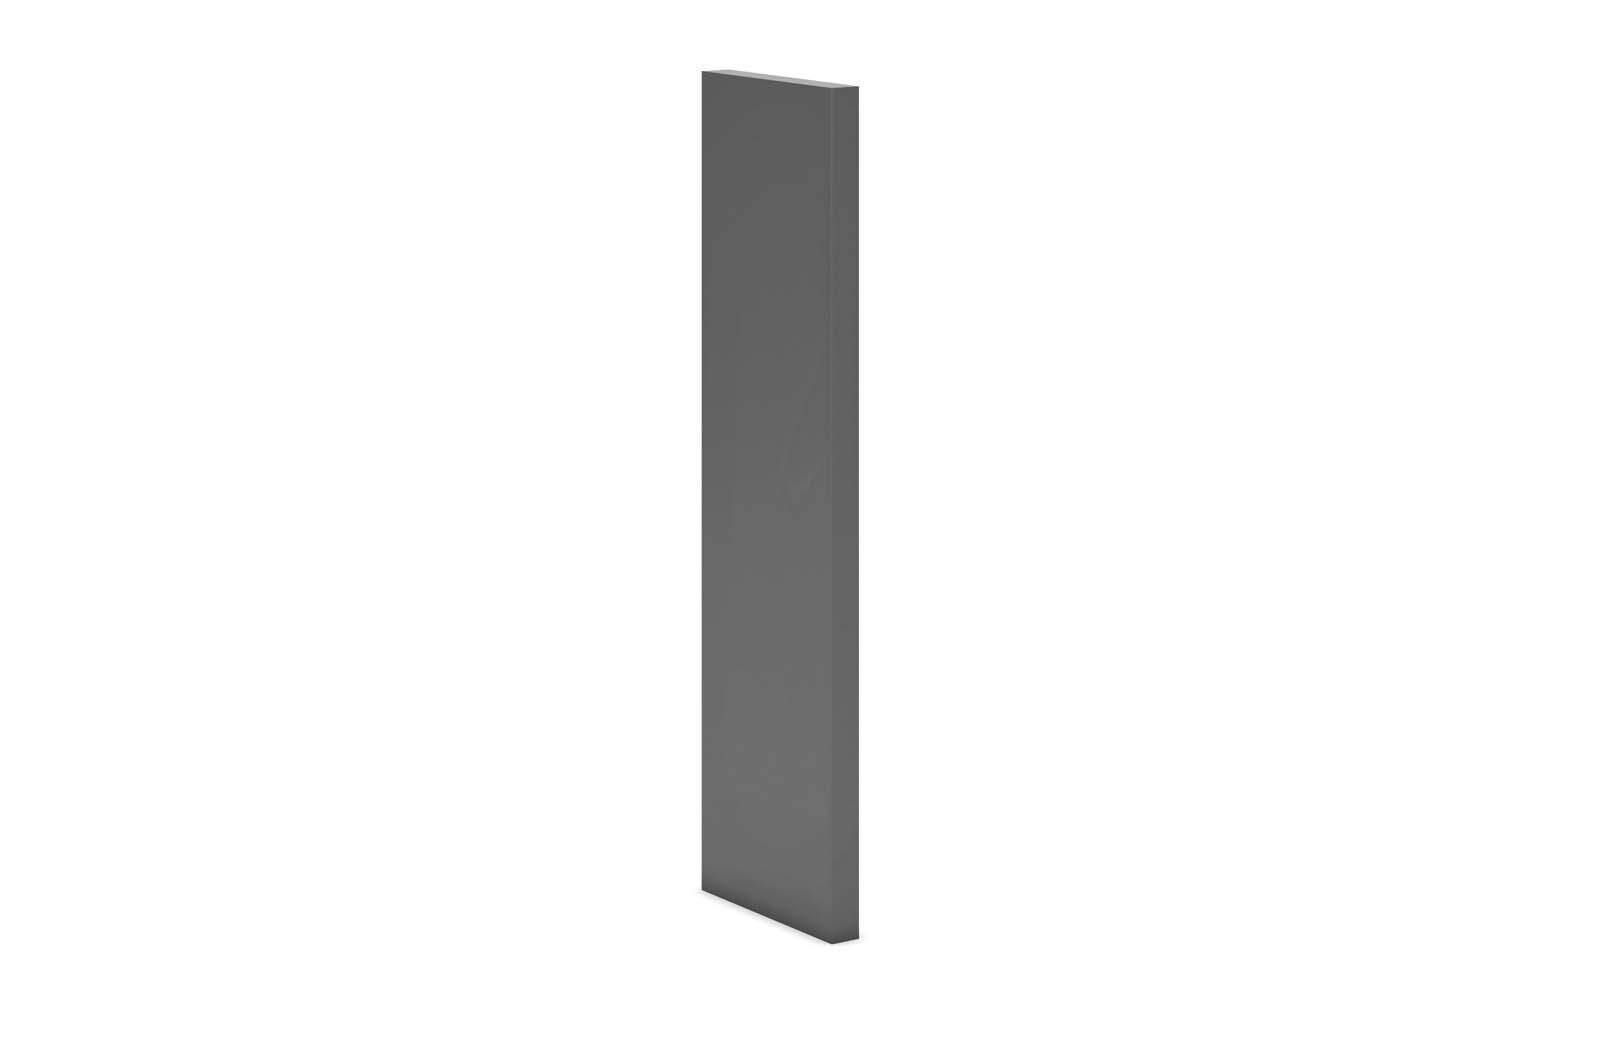 Центральная опора навесных полок 800x550x2000